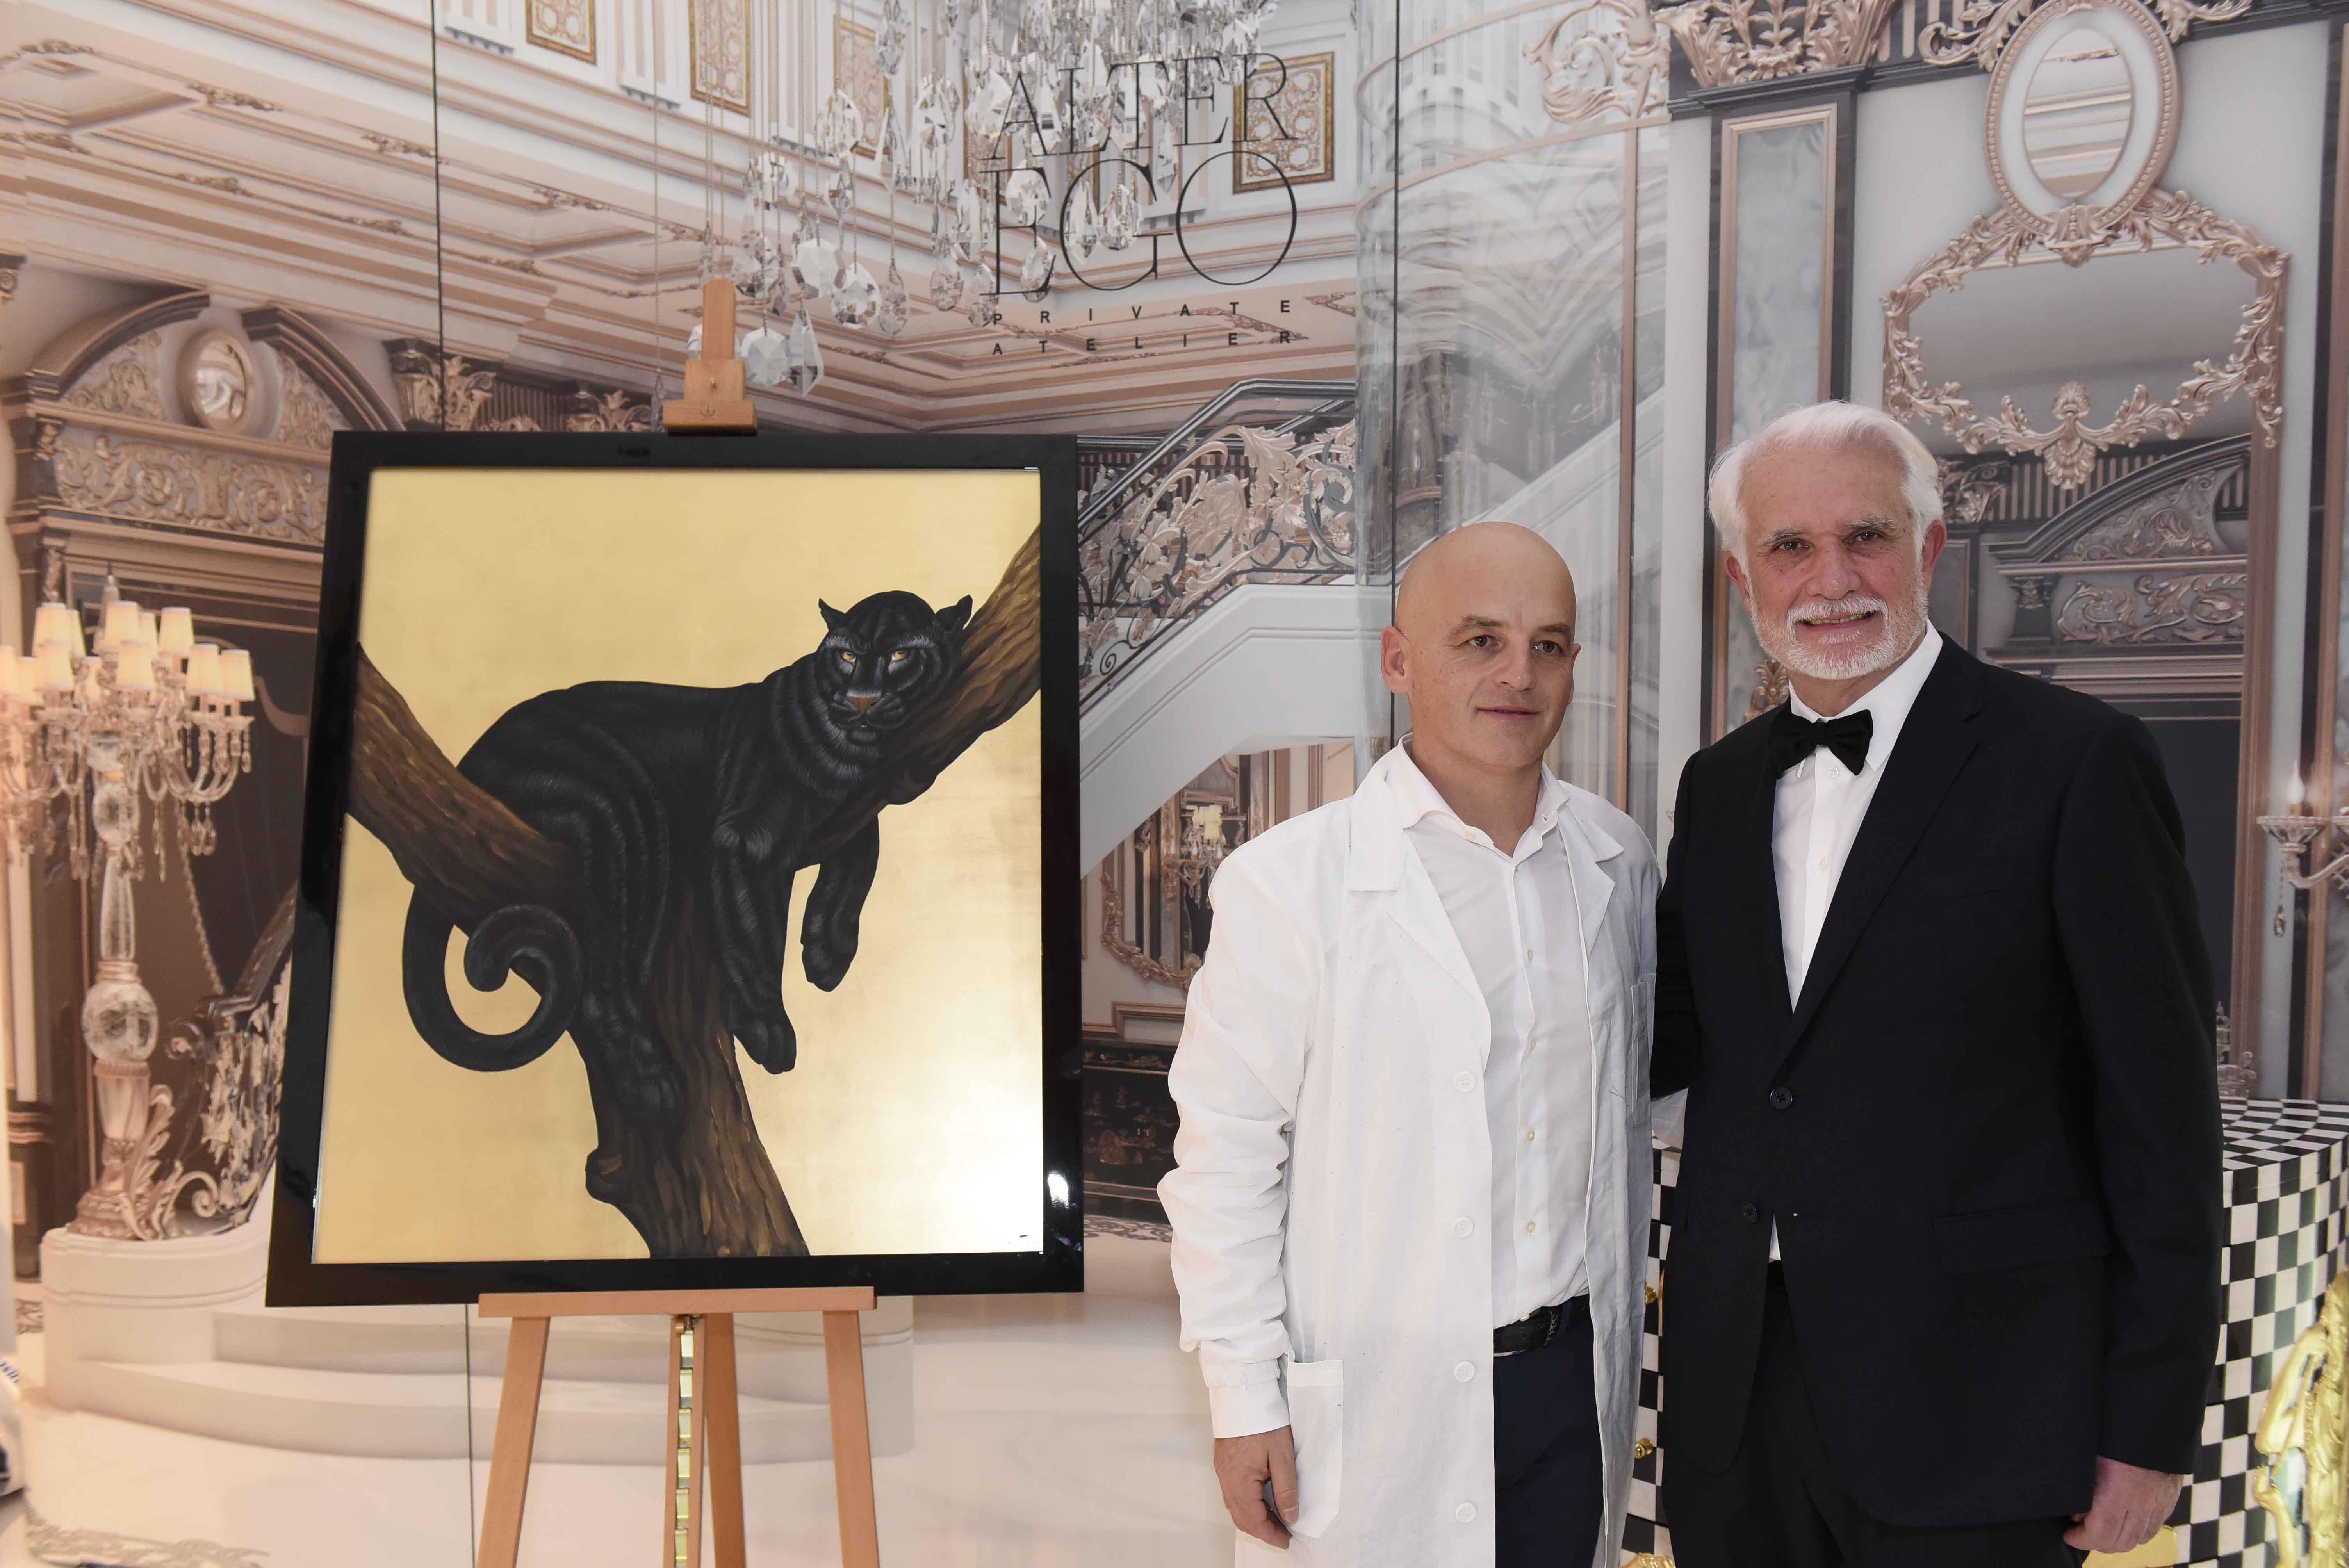 L-R-Massimo-Tasca-Alter-Ego-Design-Artiste-and-Lucio-Doro-President-Alchymia